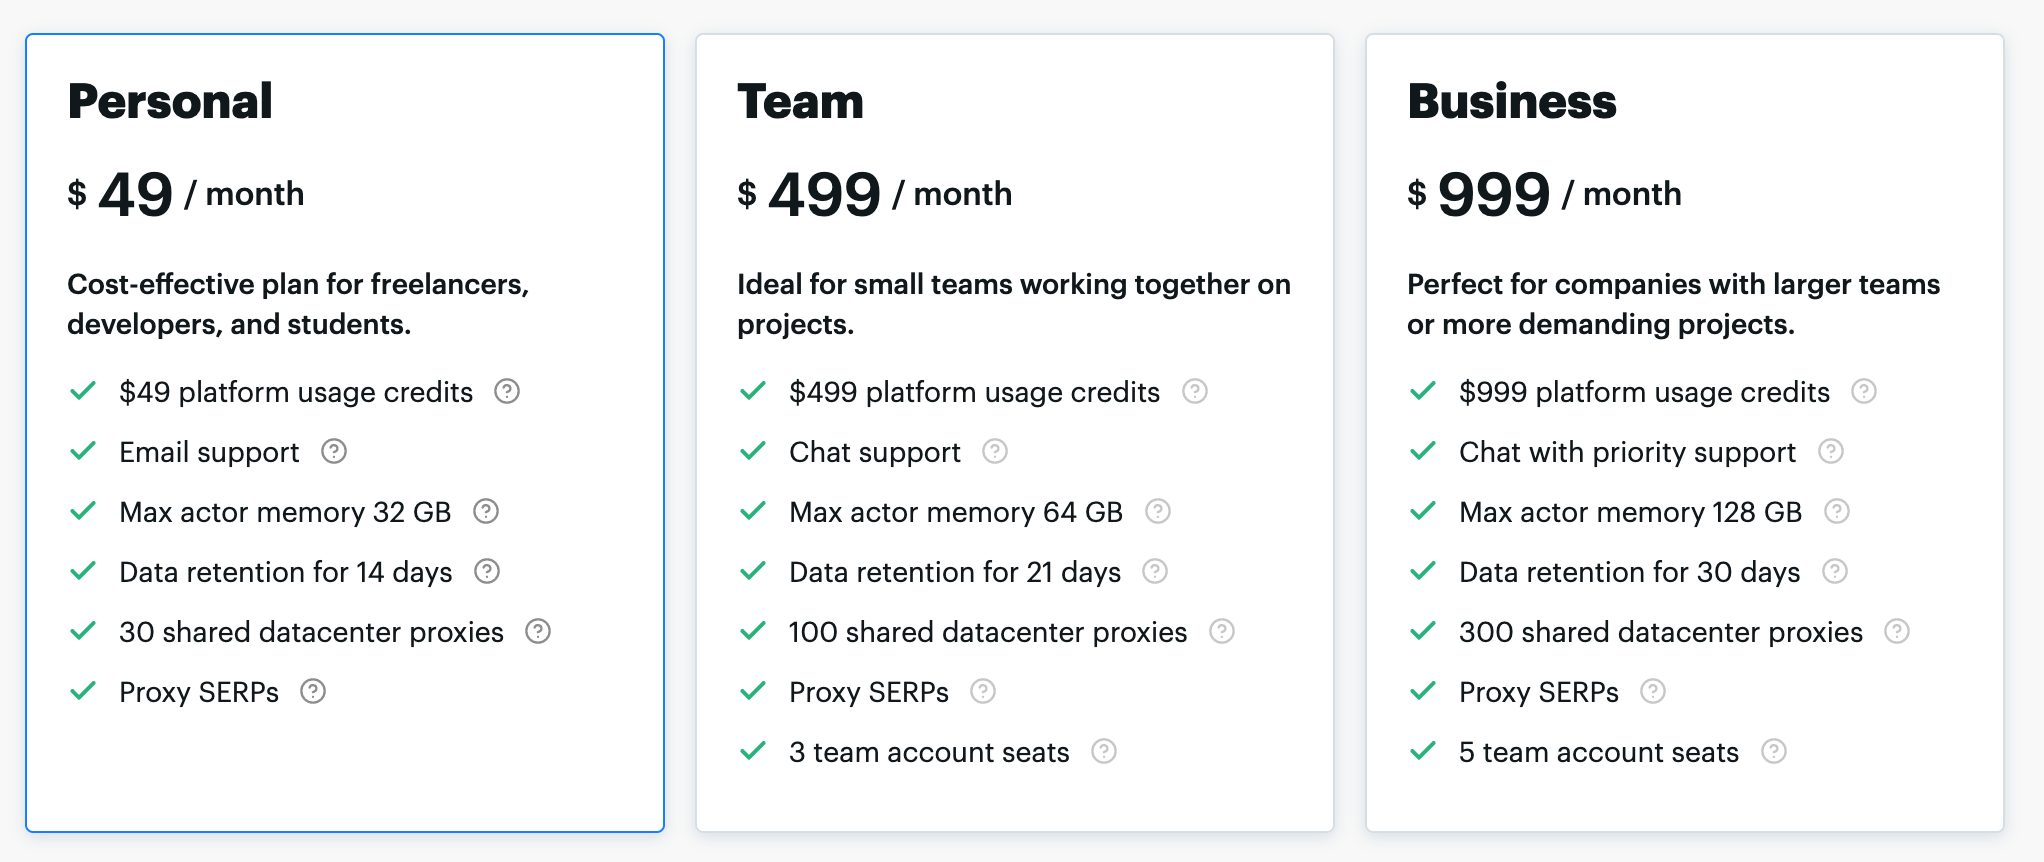 A comparison of Apify's paid plans